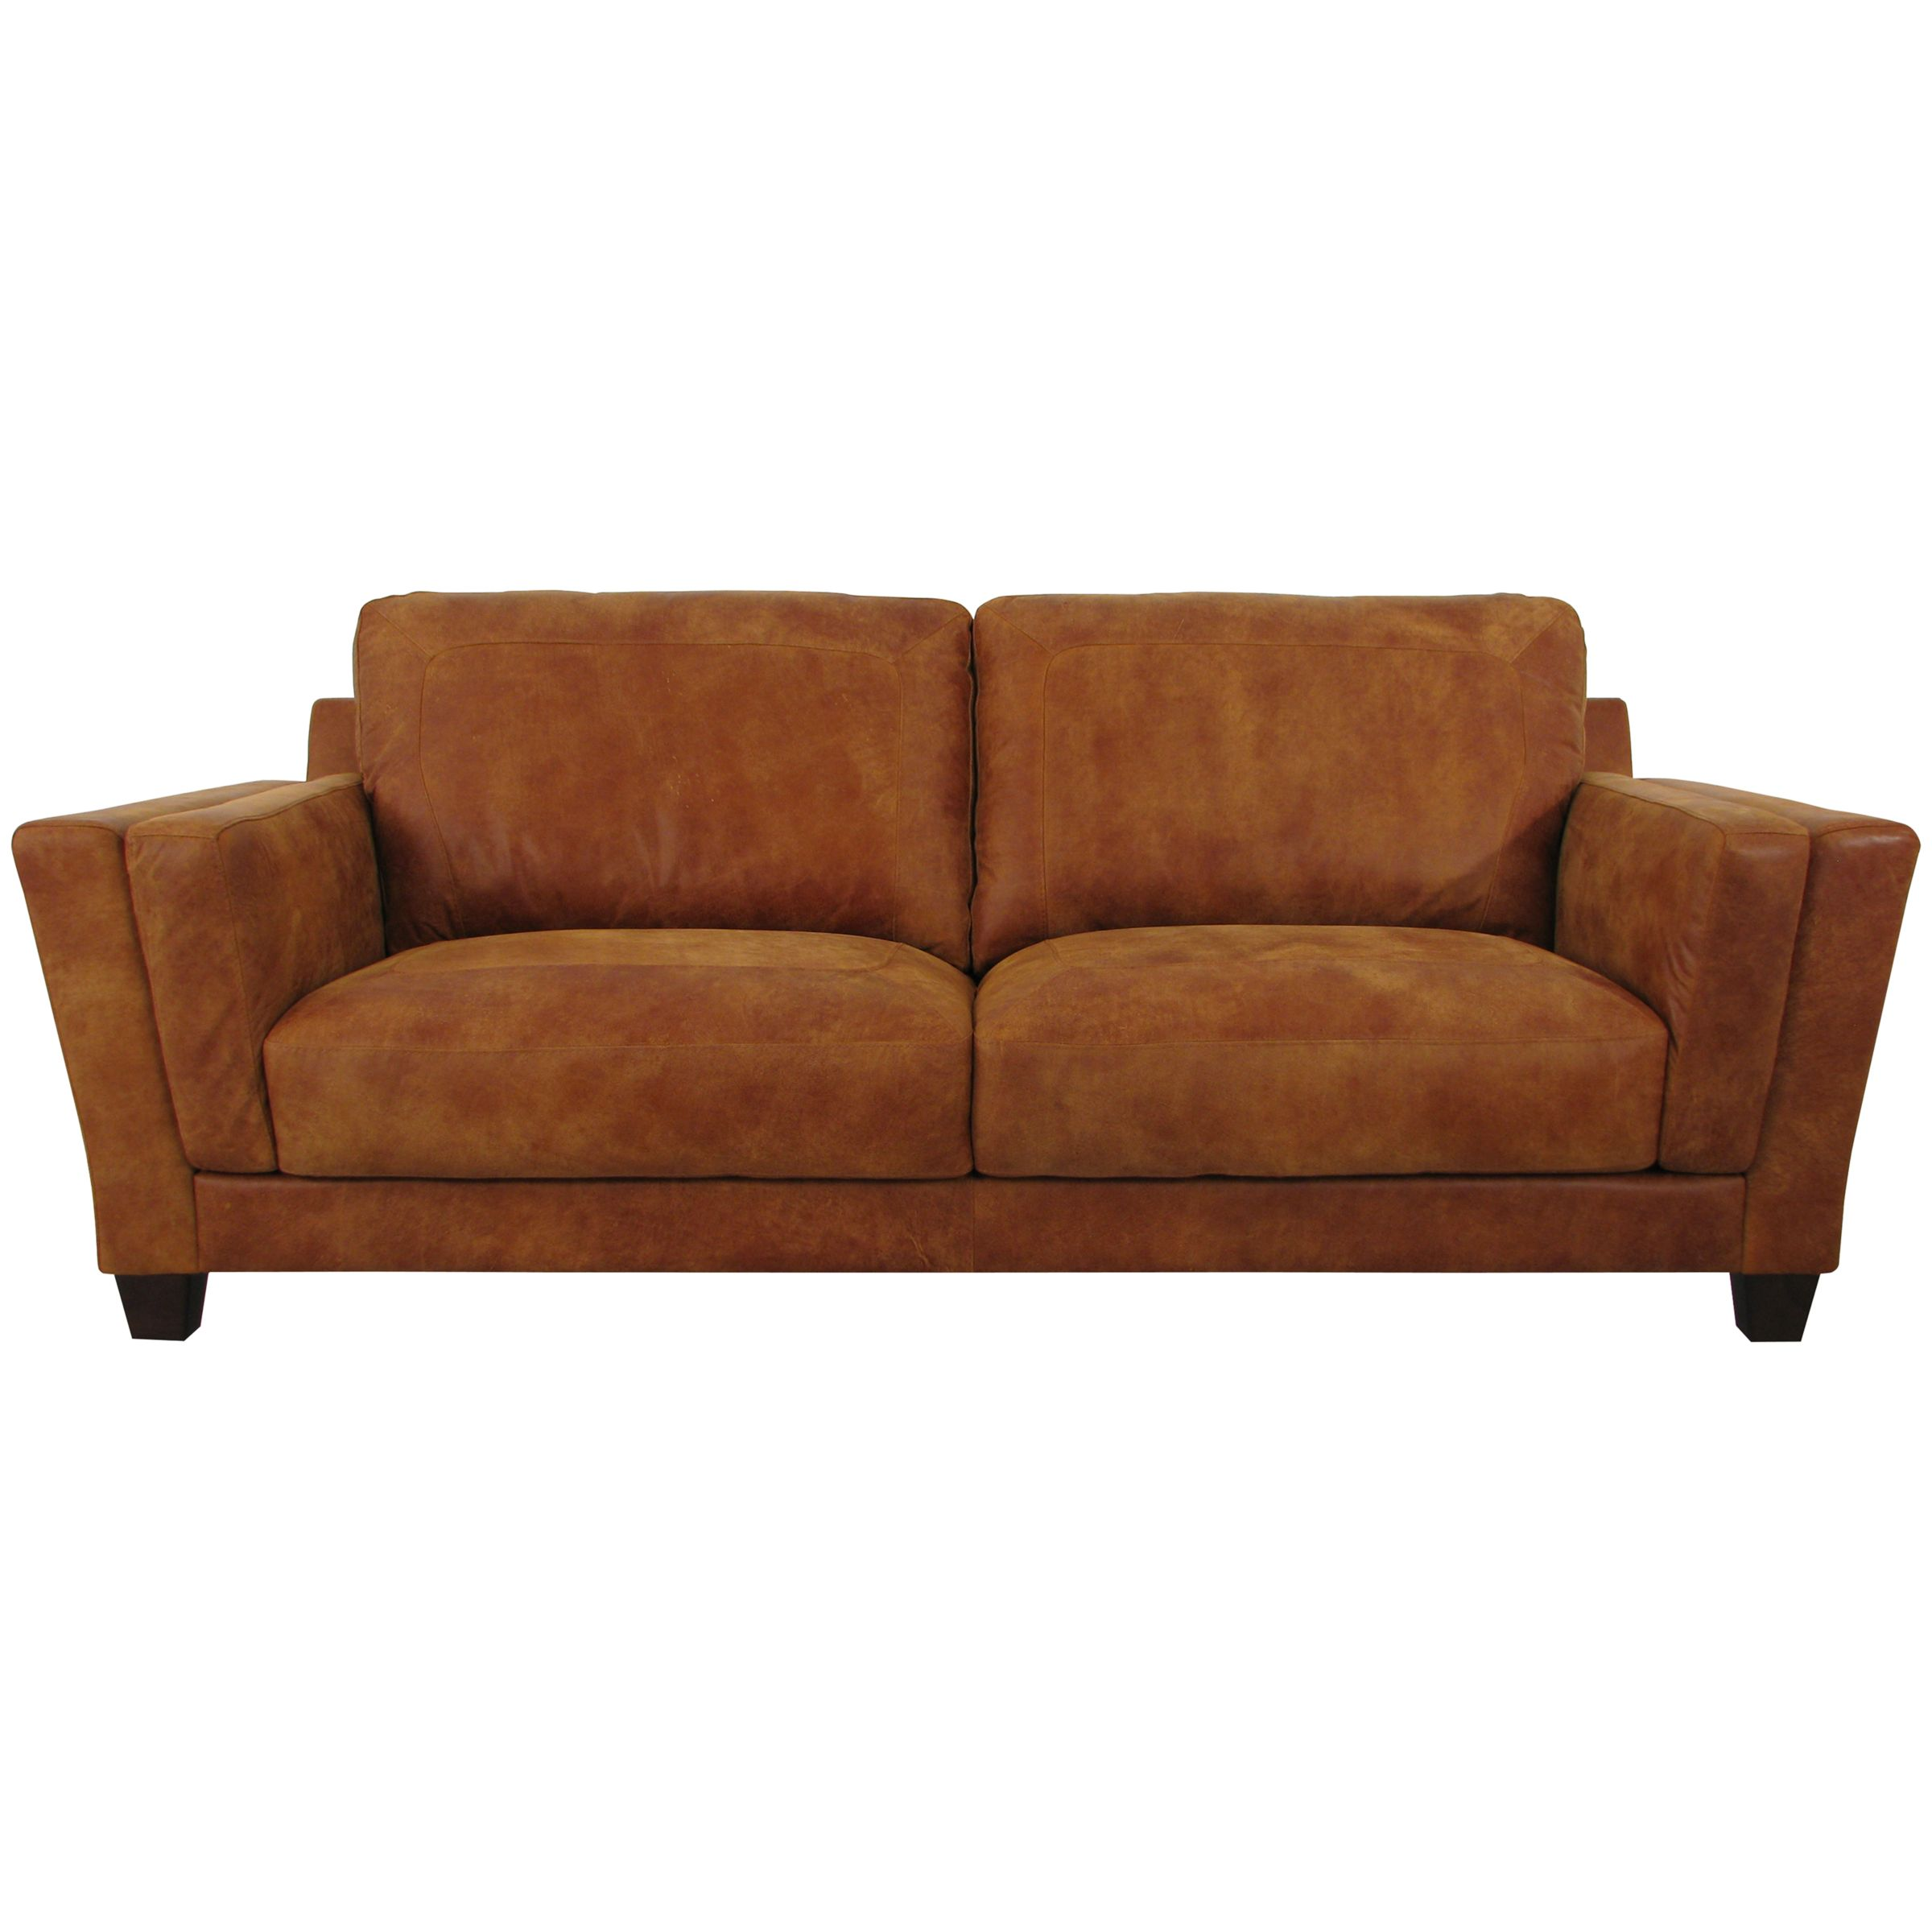 Marino Leather Sofa Brown Leather Poltrona Frau Linea A Three Seat